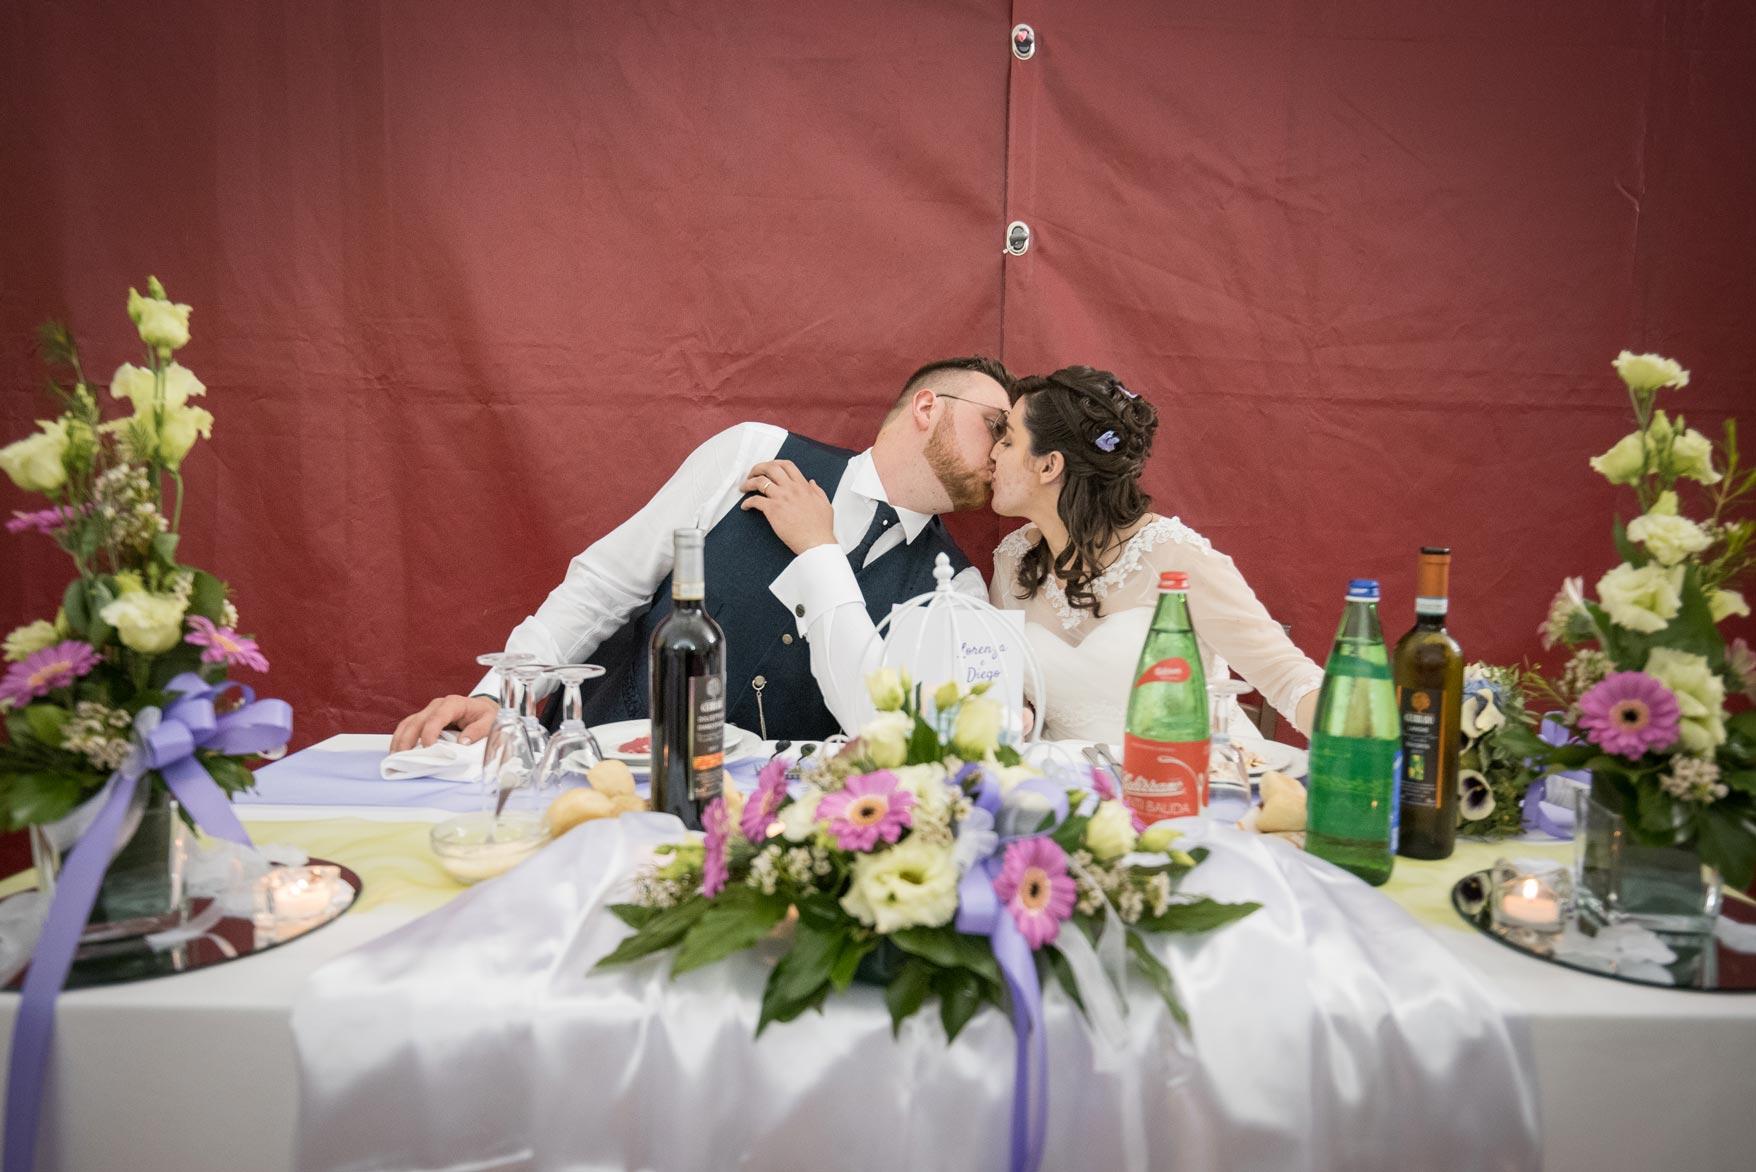 Matrimonio a Narzole Lorenza Diego - DSC 0790 - Fotografie matrimonio ricevimento - Fotografie matrimonio ricevimento